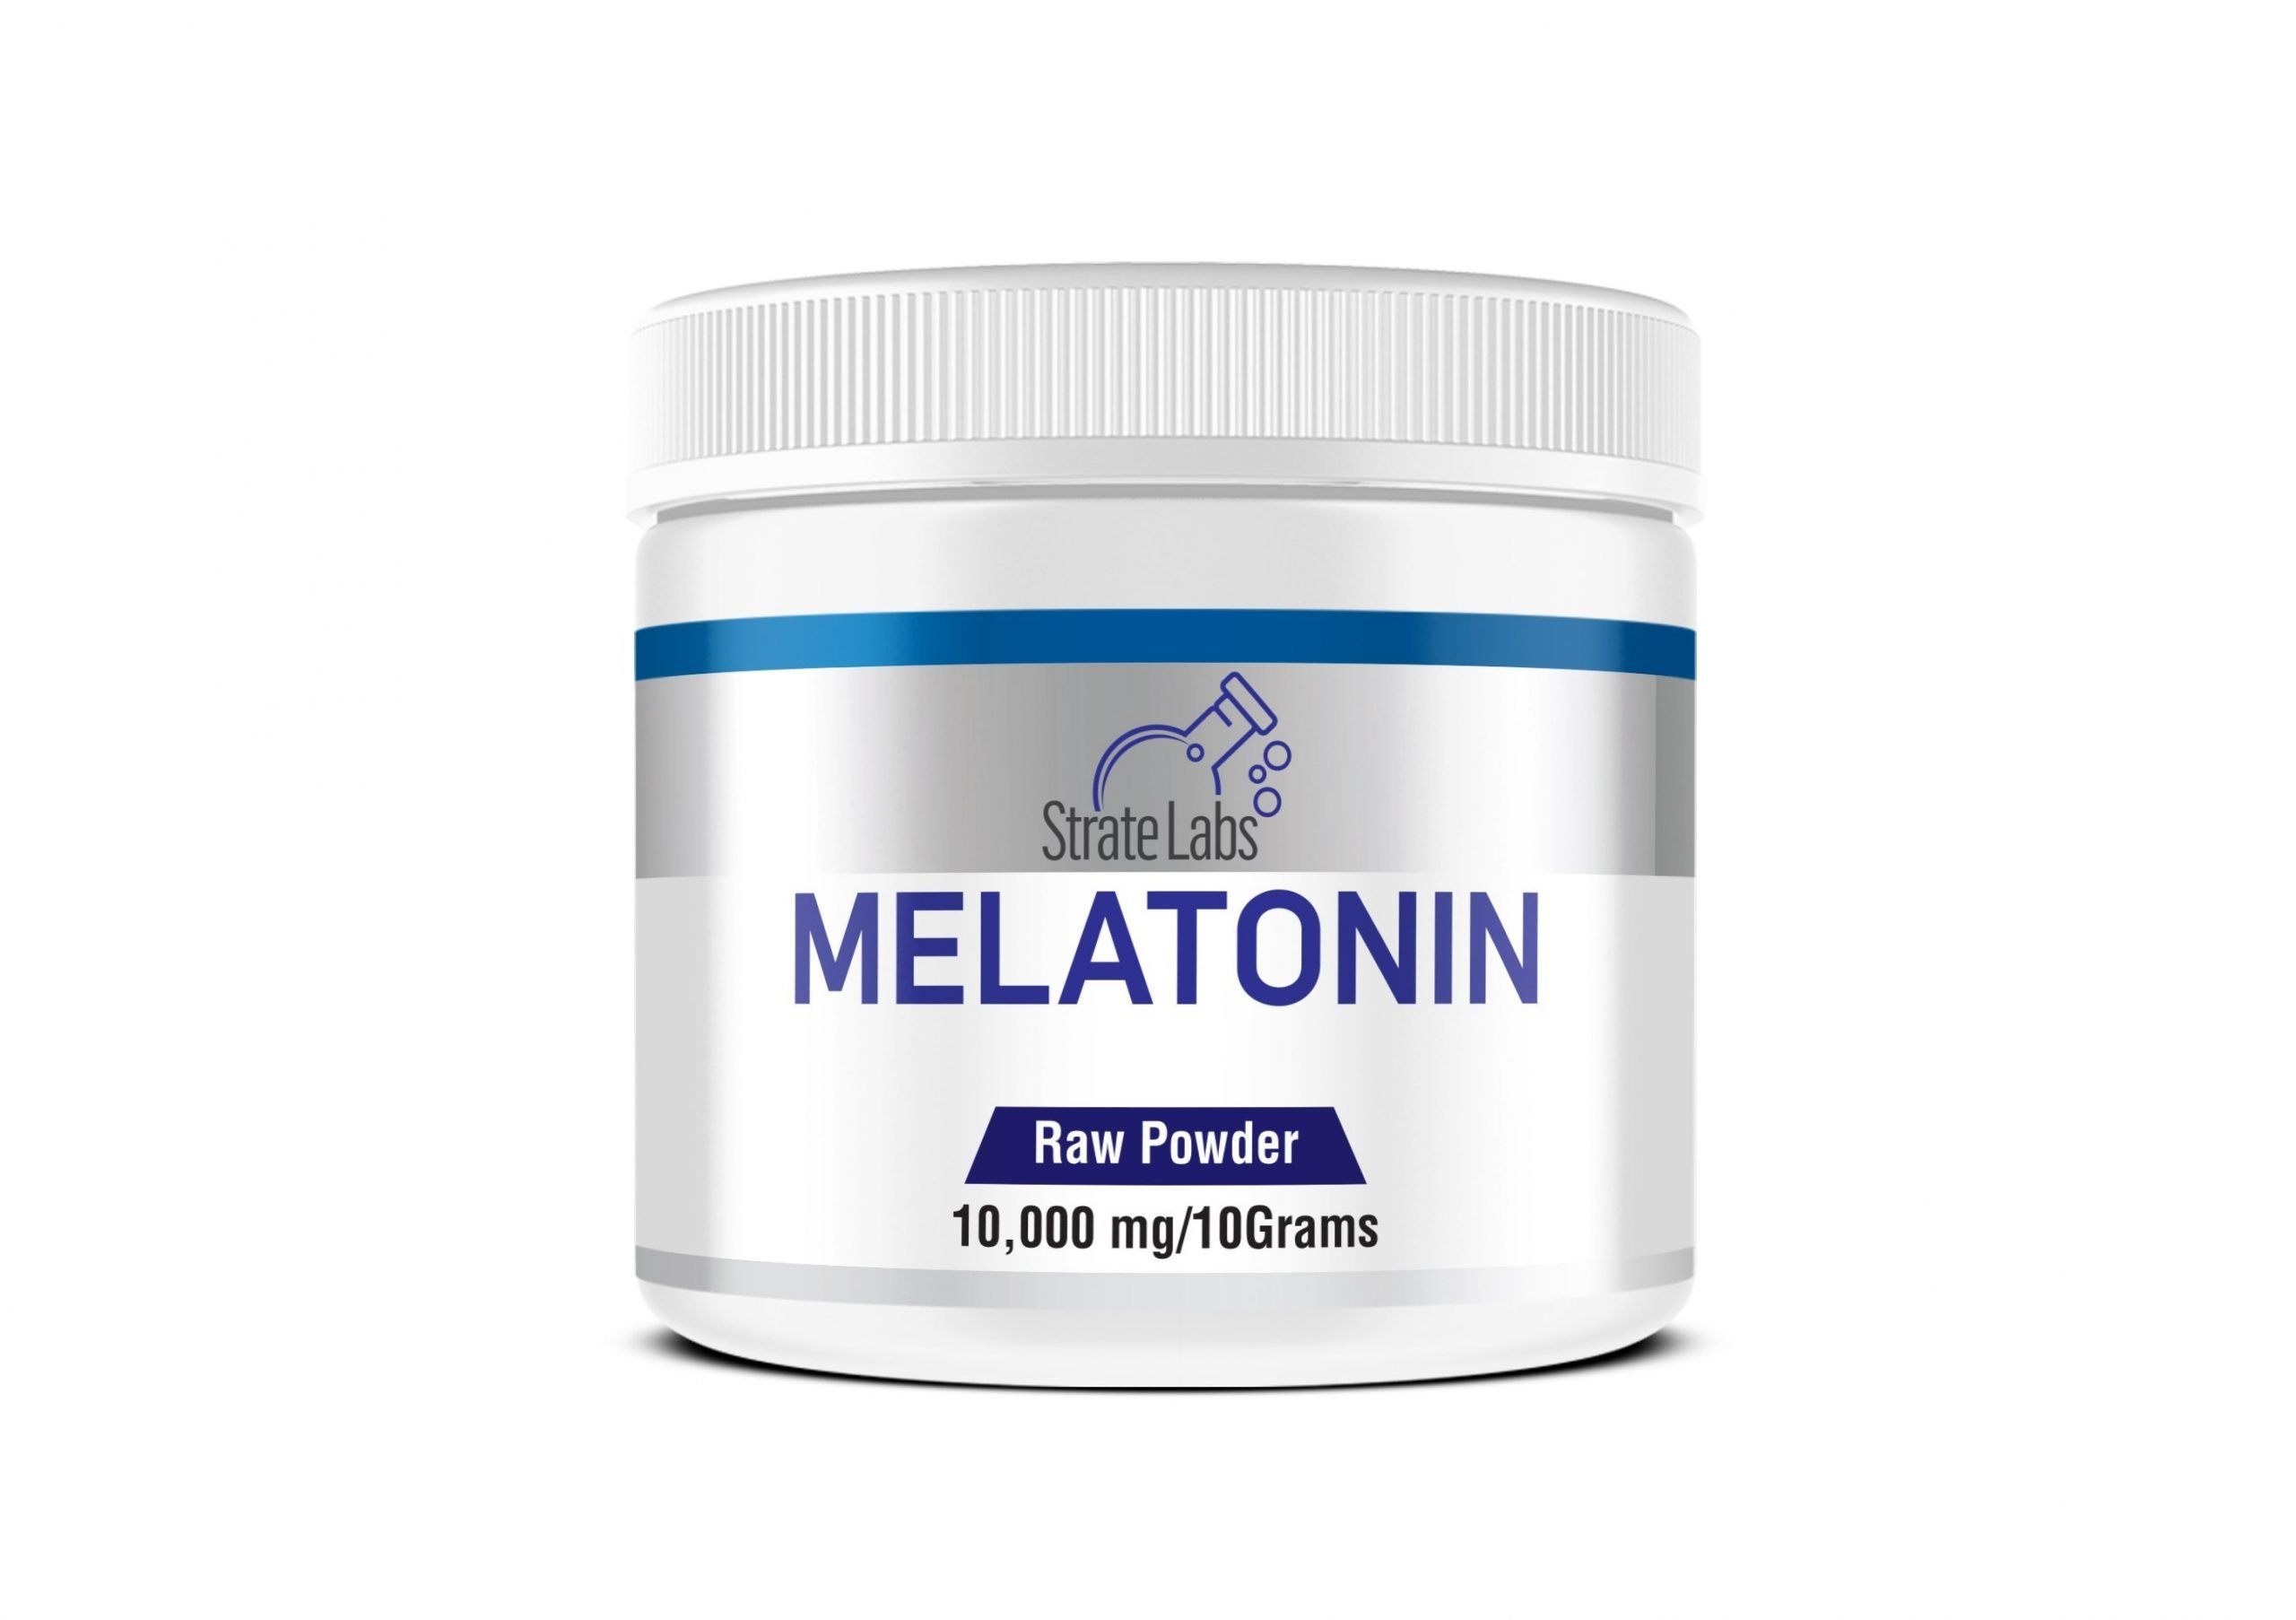 MELATONIN Powder | 10,000MG - Strate Labs